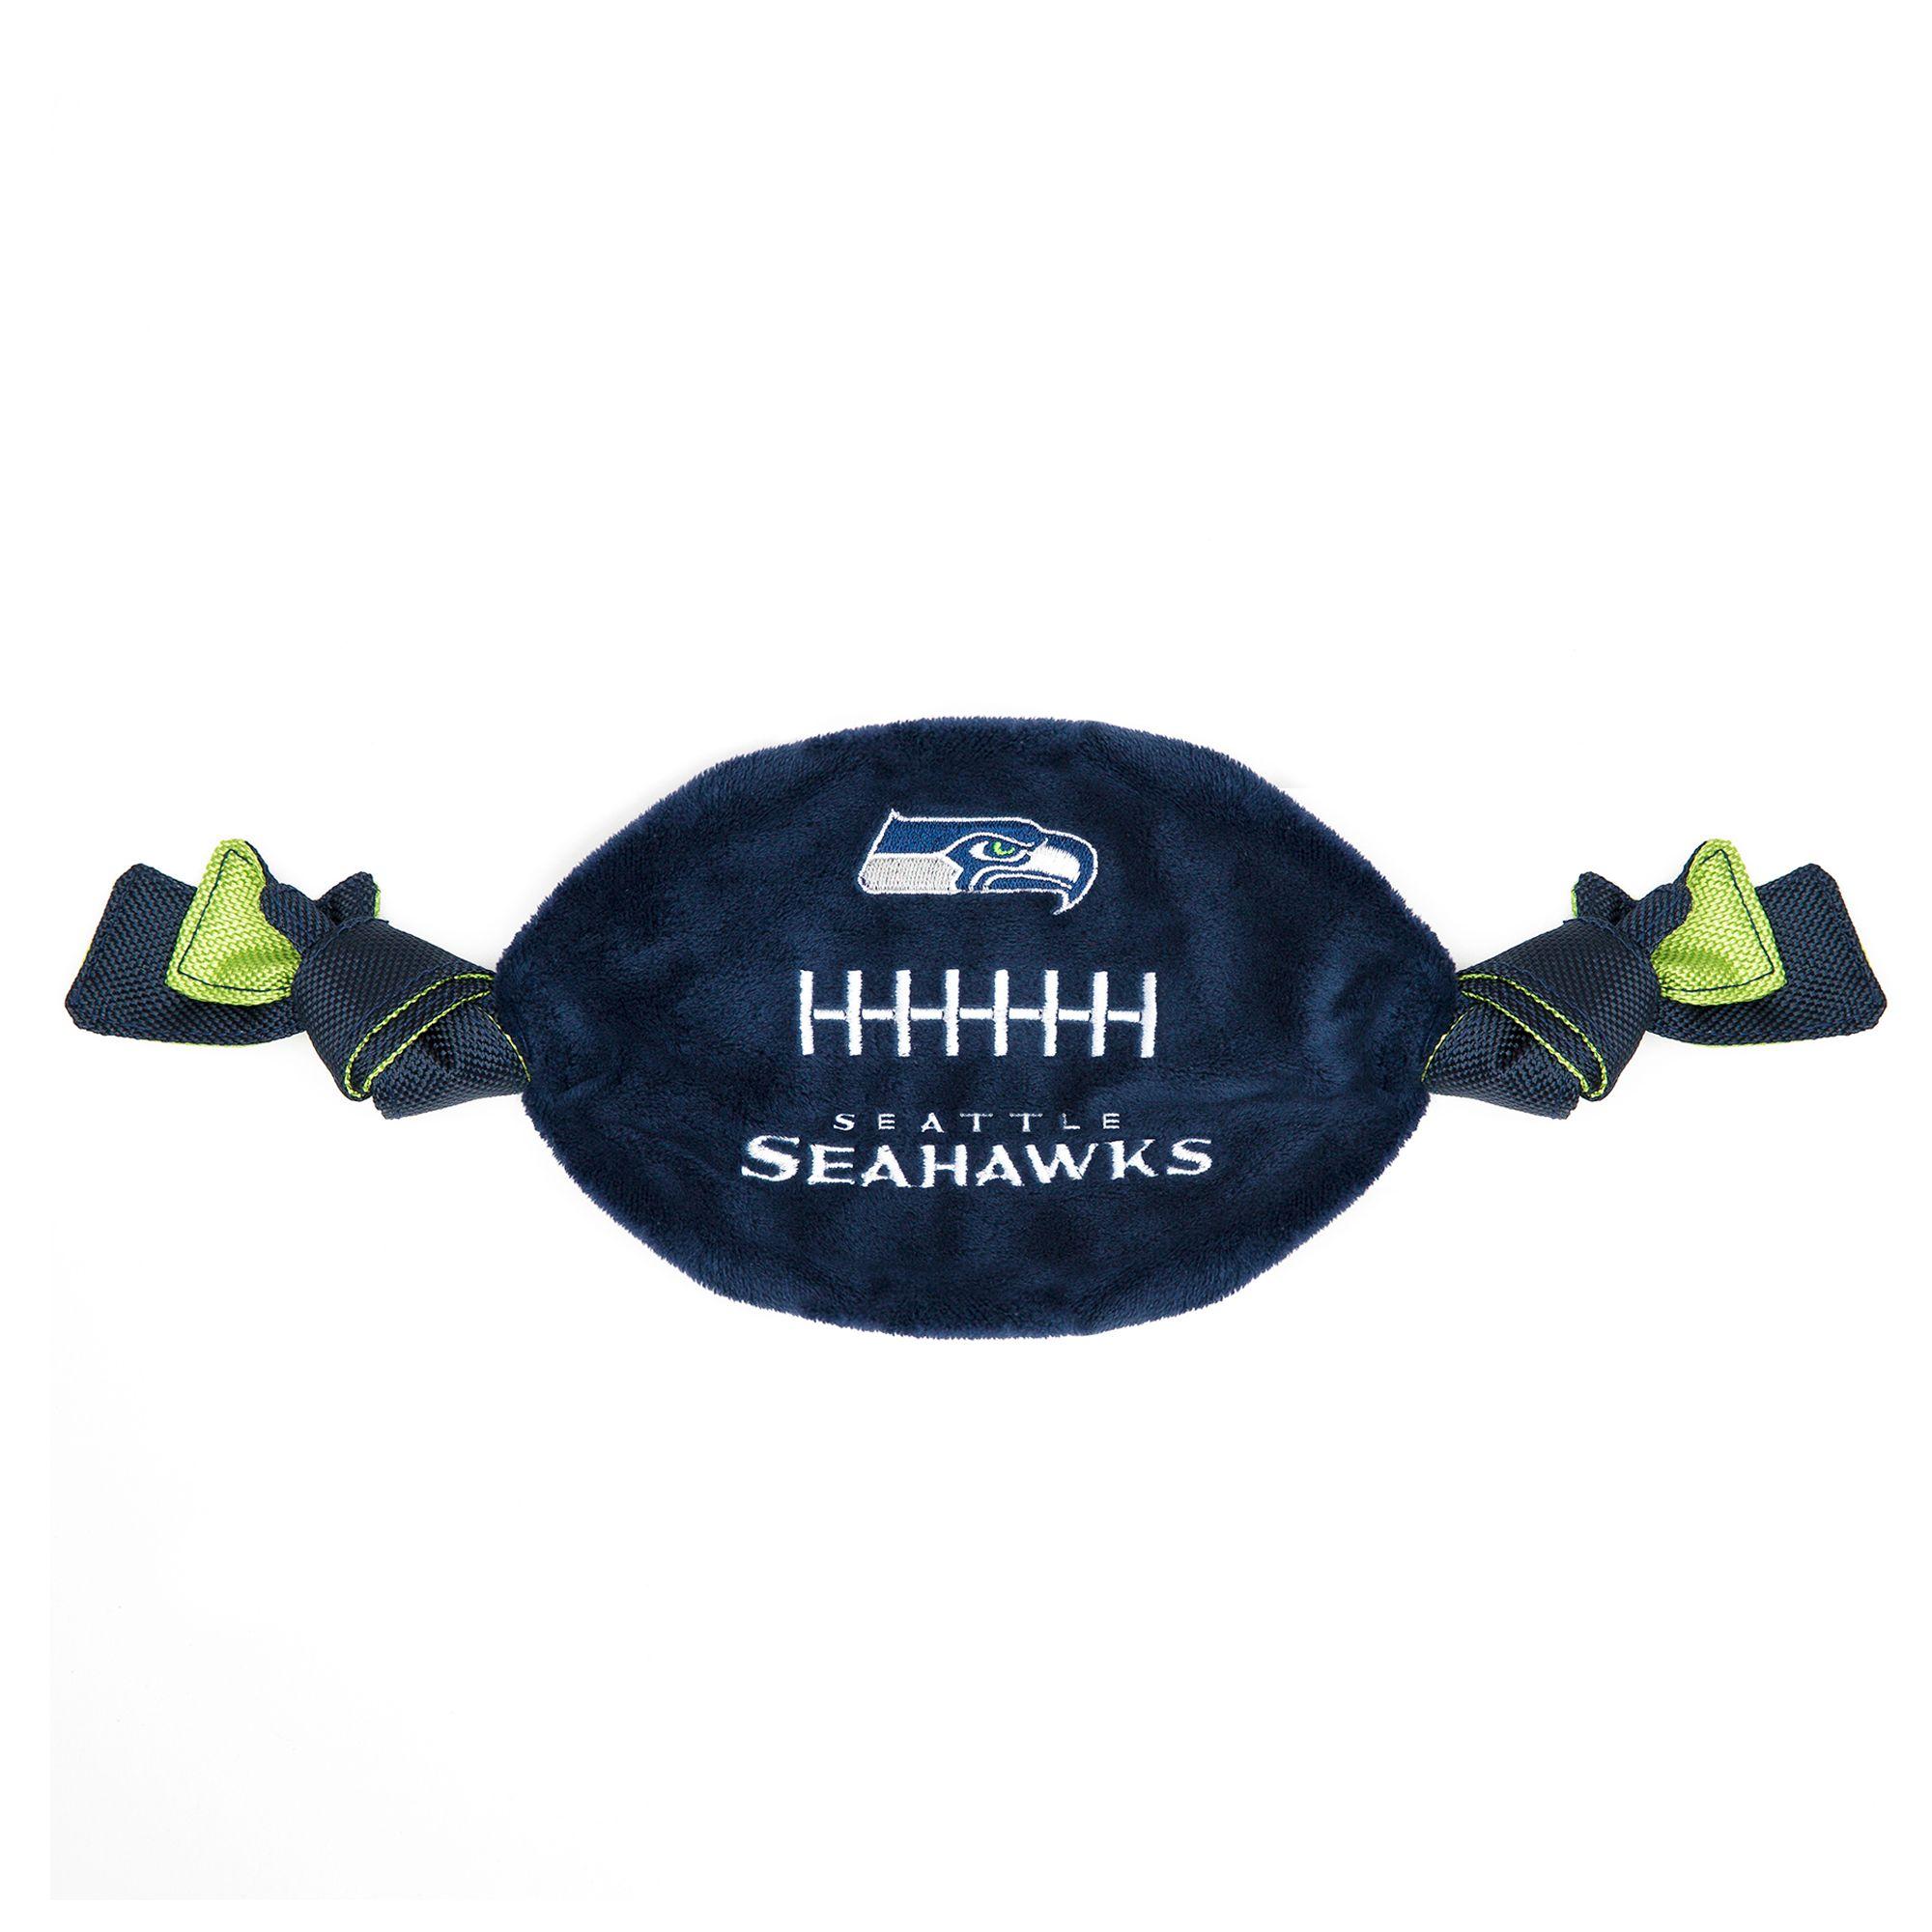 Seattle Seahawks NFL Flattie Crinkle Football Toy, Pets First 5259769